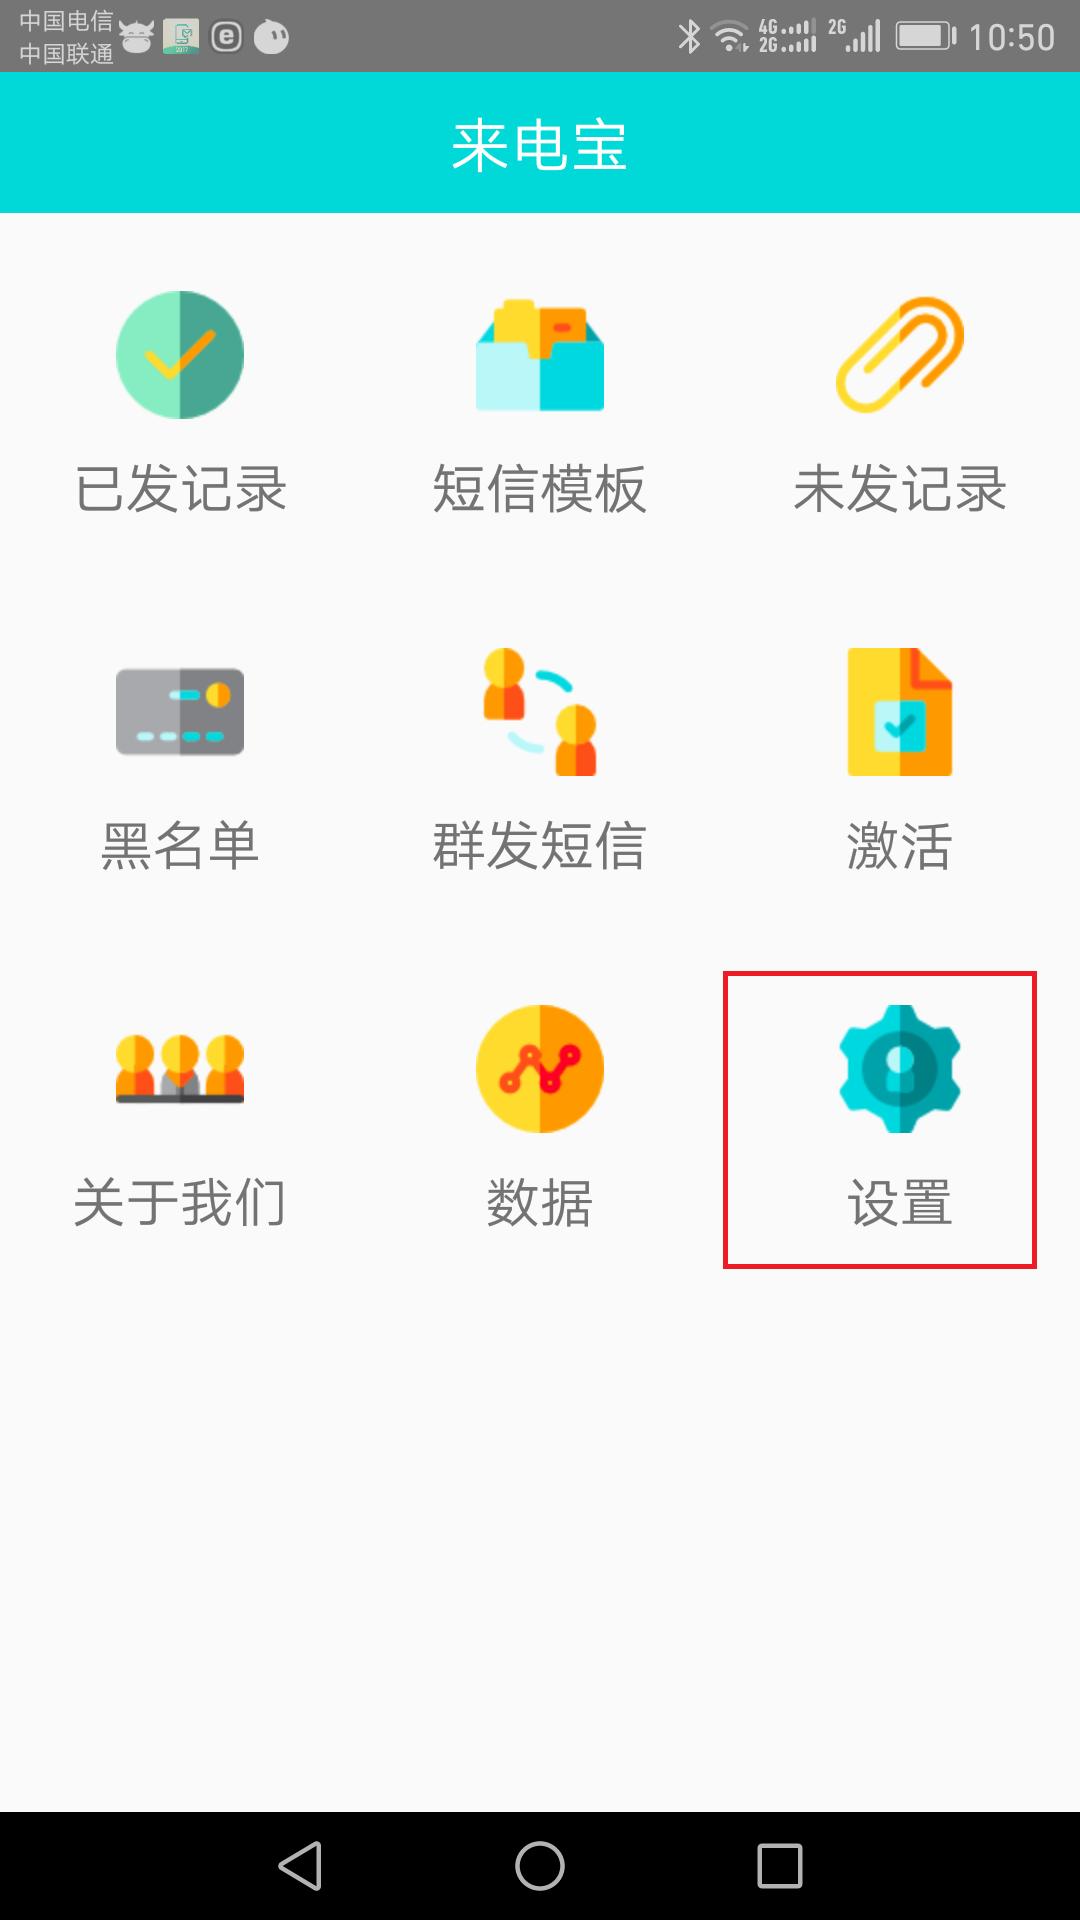 Screenshot_20170218-105050.png